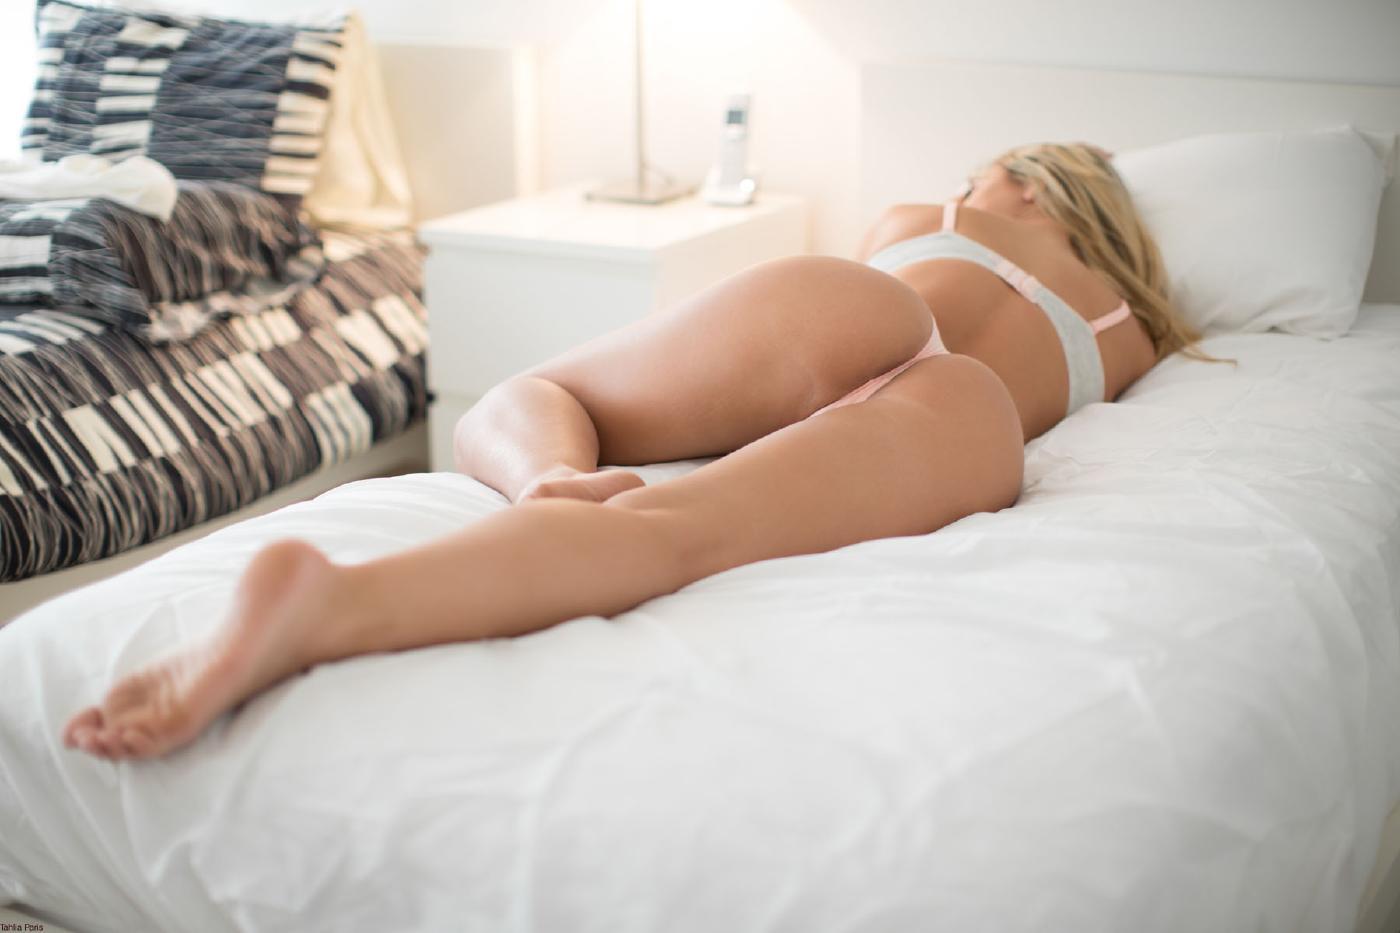 Thalia Paris Nude Bedroom Onlyfans Set Leaked Xqnrhh